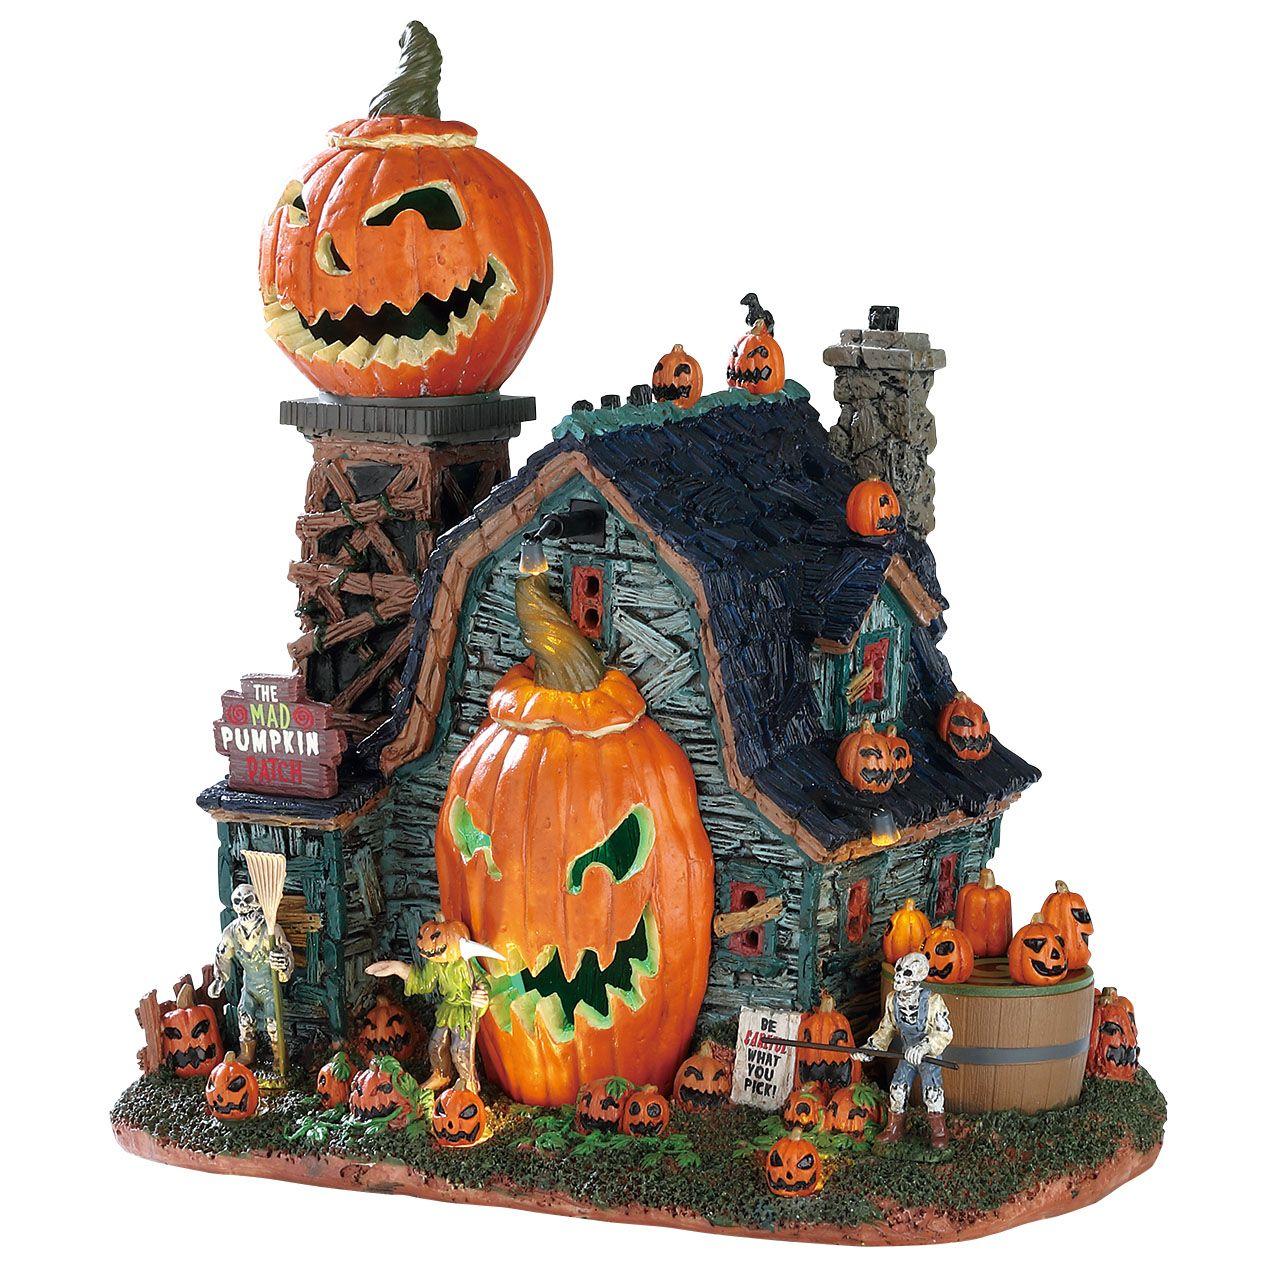 The Mad Pumpkin Patch Lemax 75172 Halloween Village